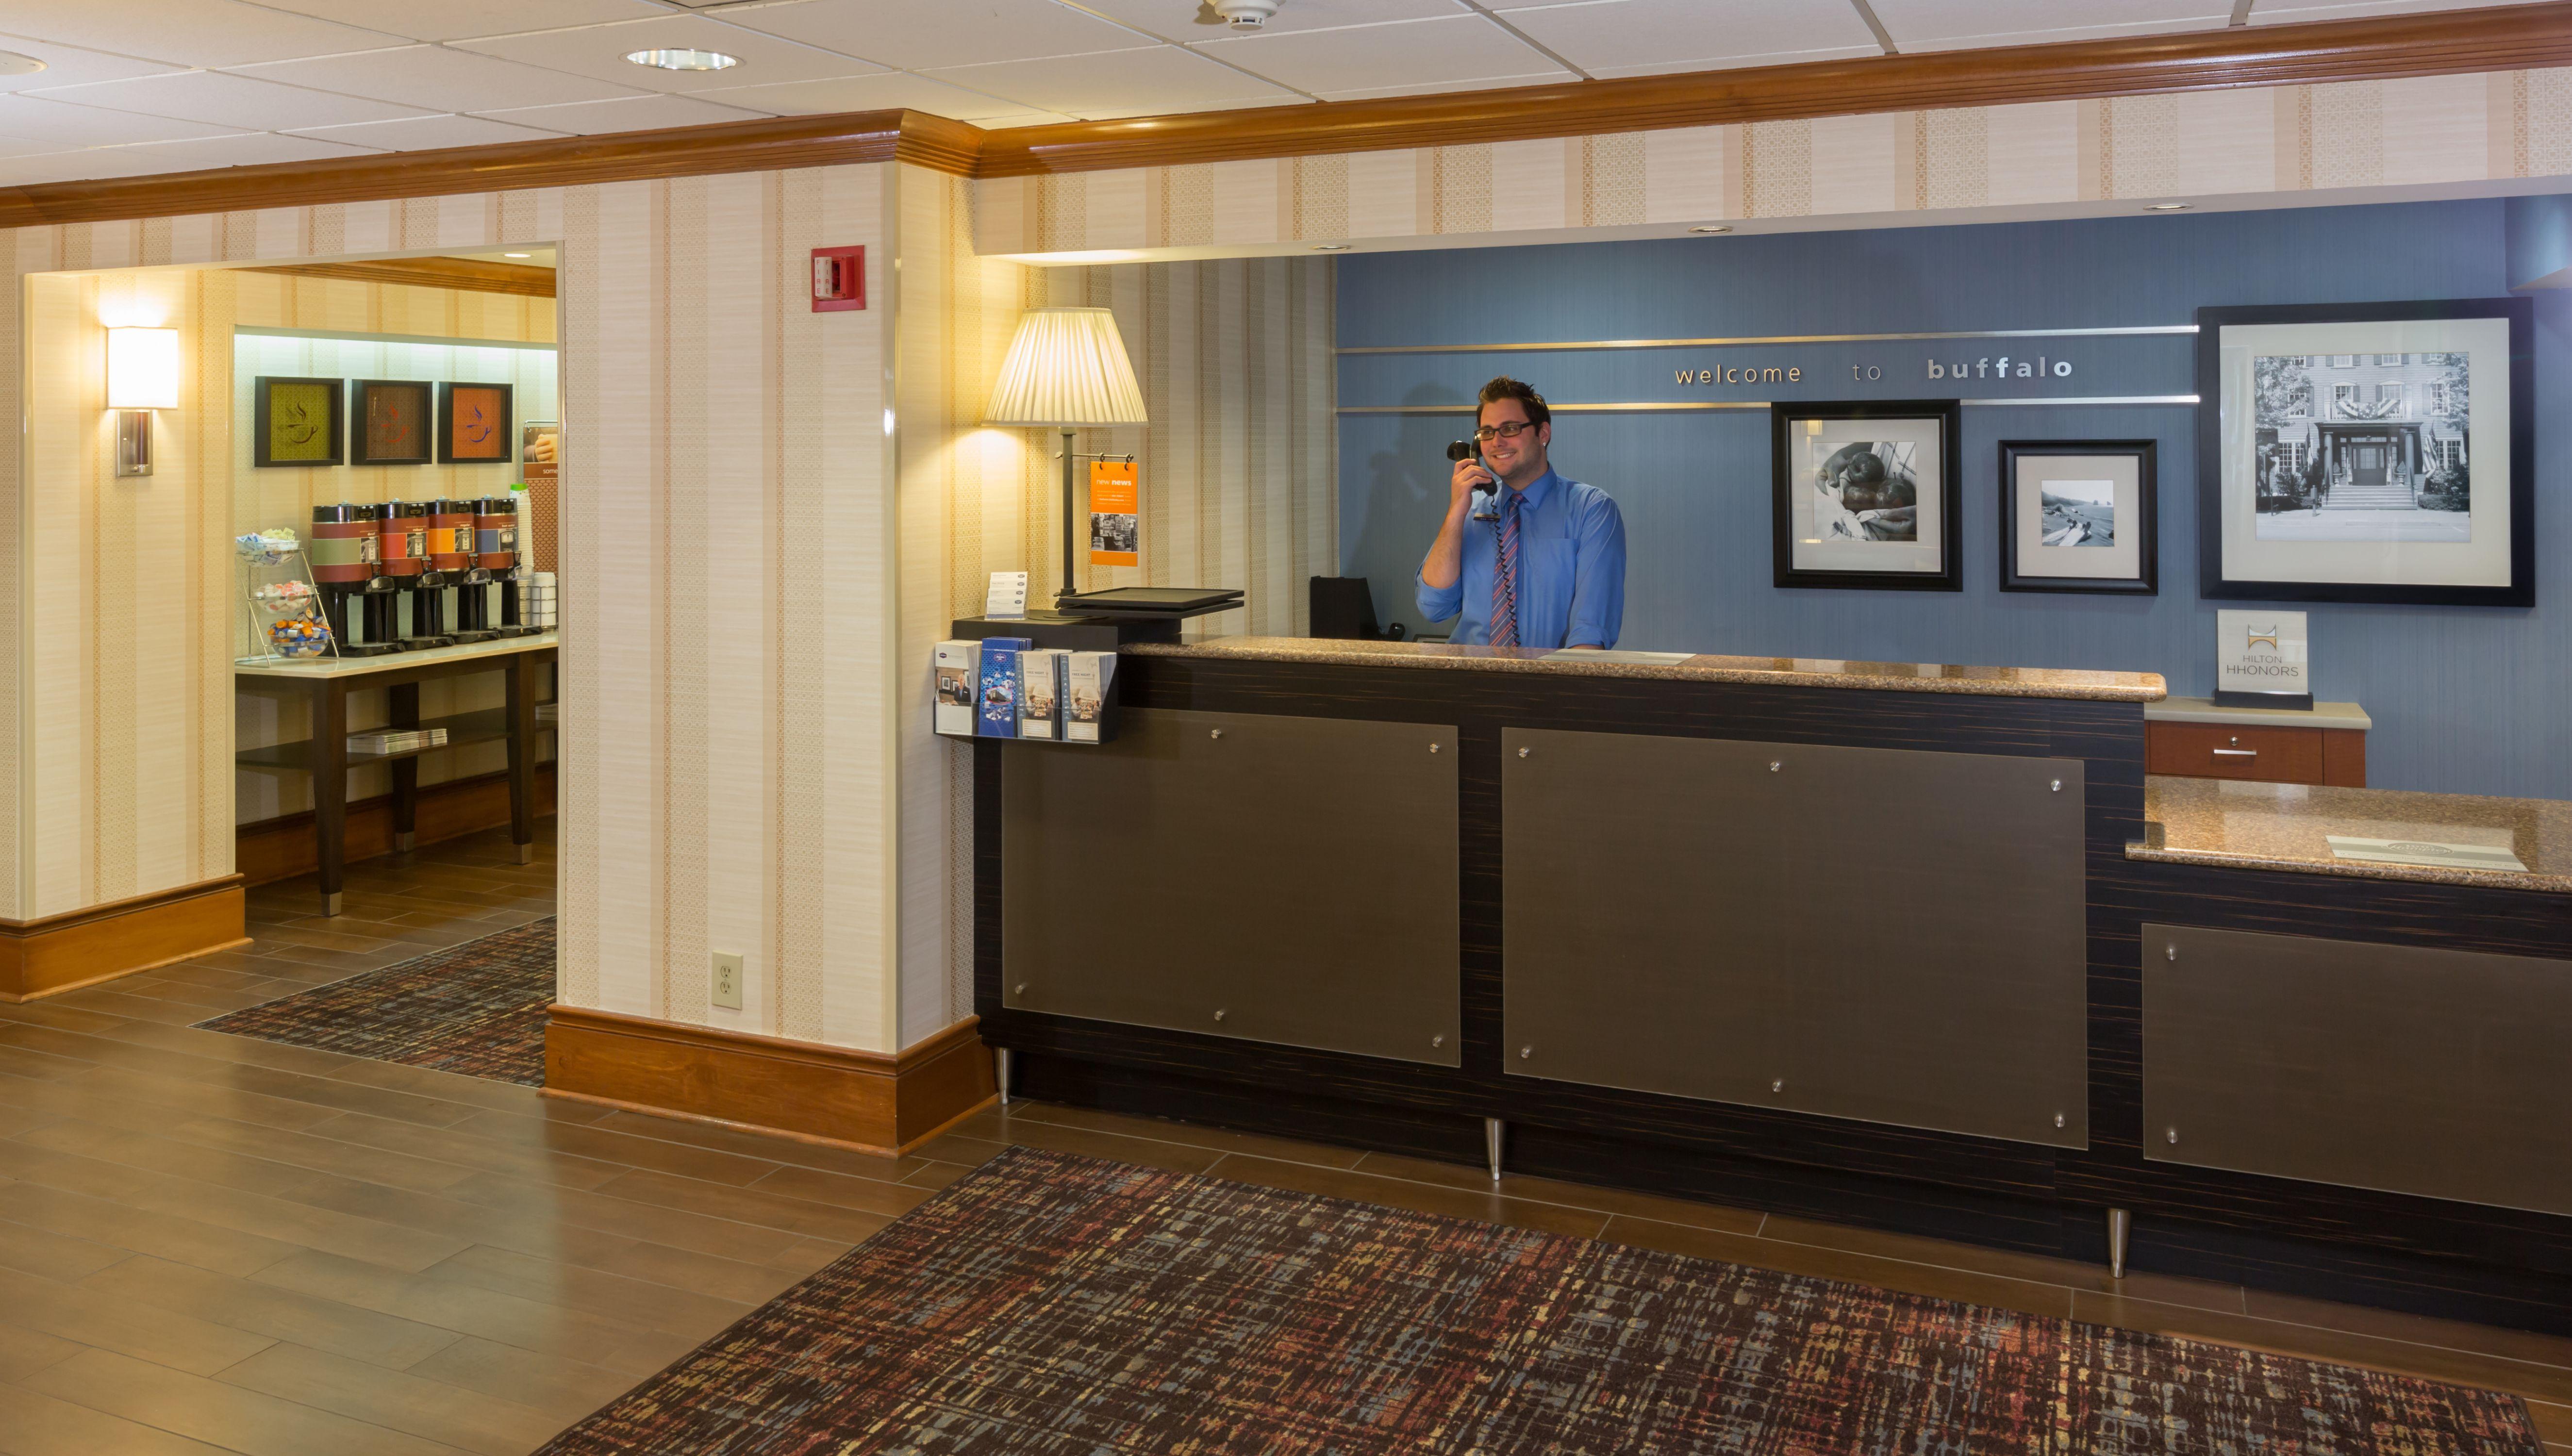 Hampton Inn Buffalo-Airport/Galleria Mall image 2